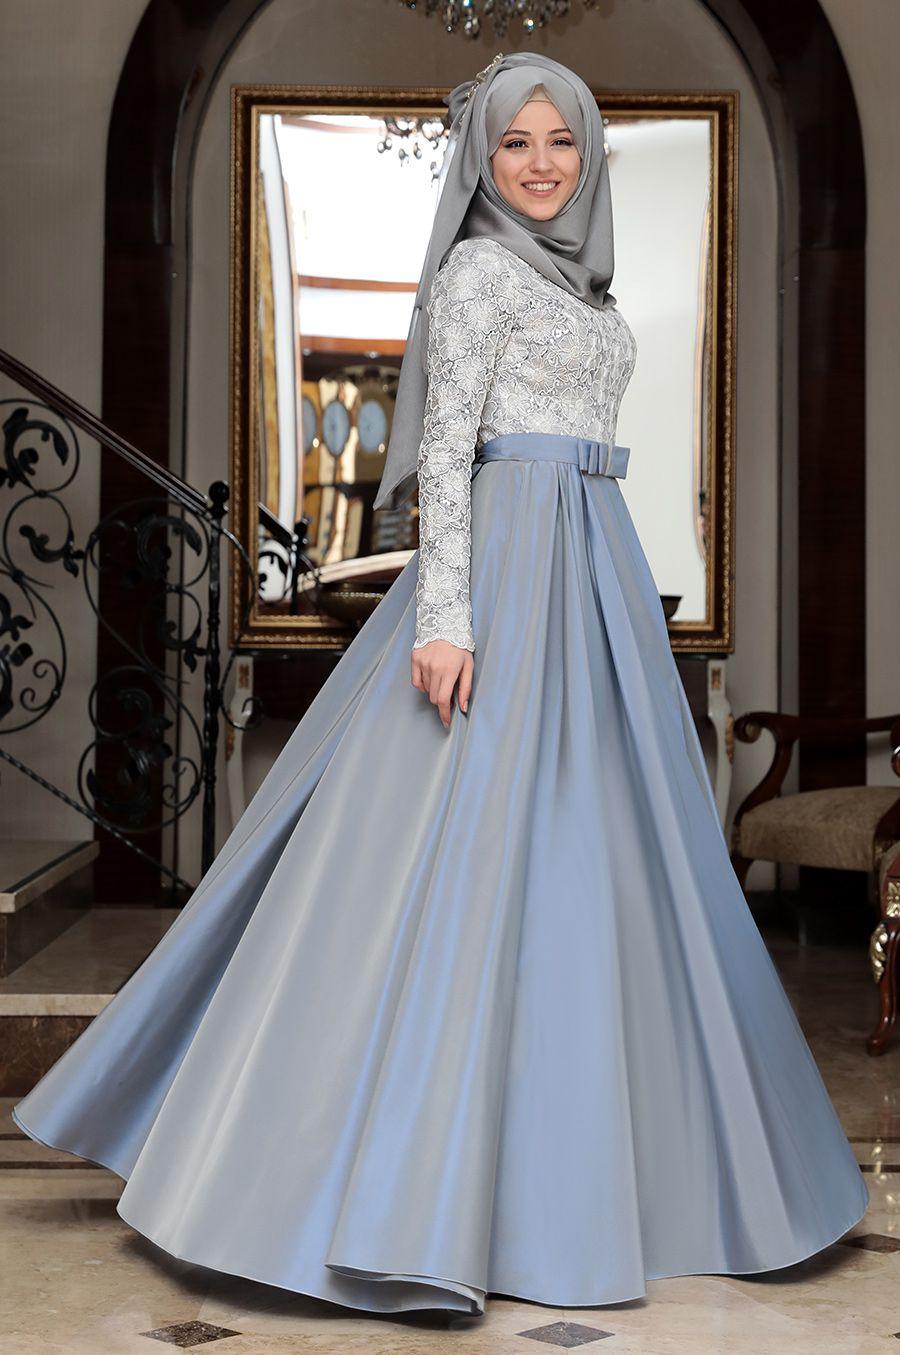 بالصور فساتين ناعمه طويله , اروع فستان رقيق للمحجبات 1280 9